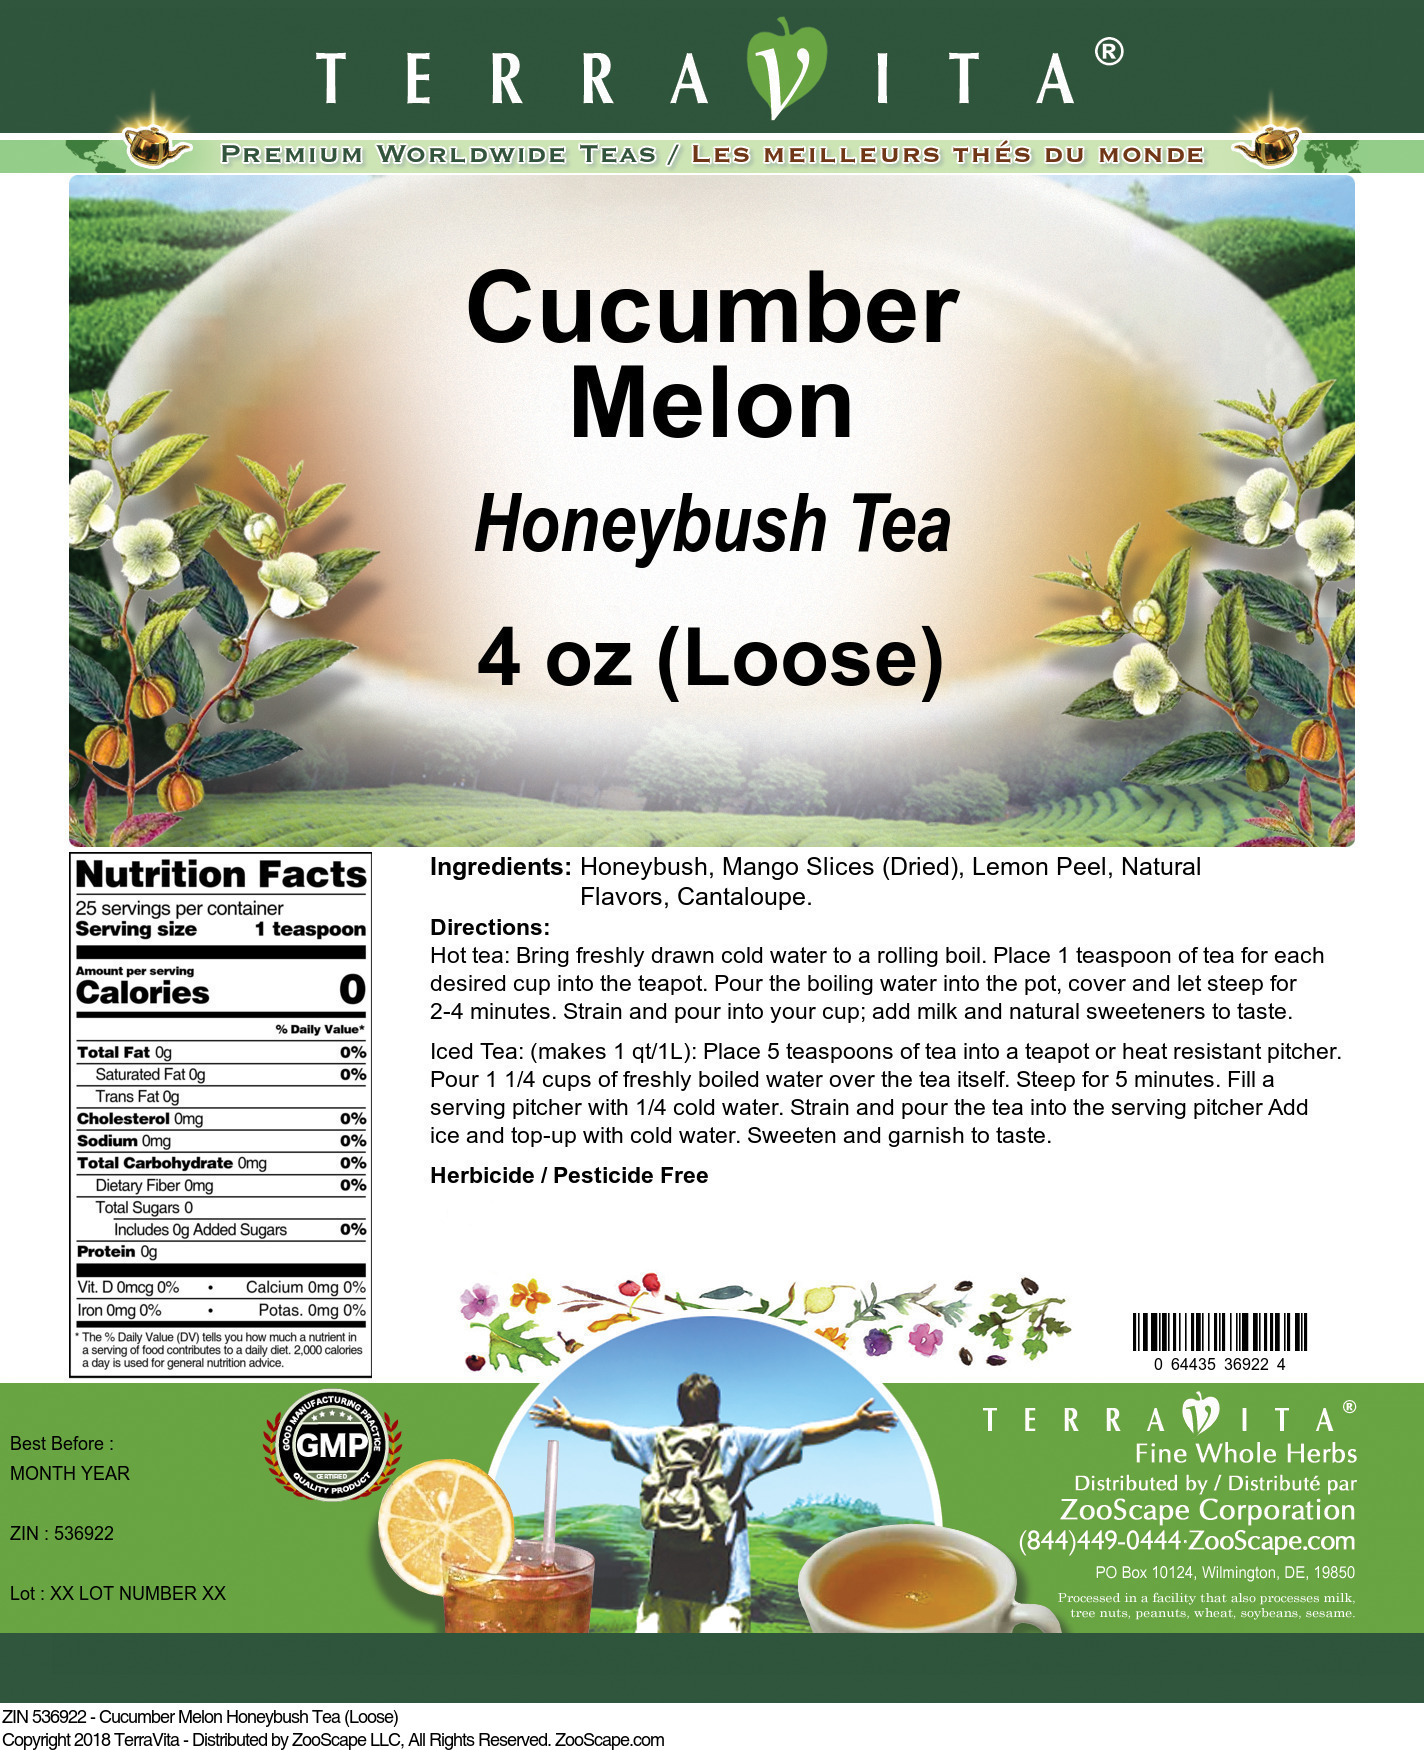 Cucumber Melon Honeybush Tea